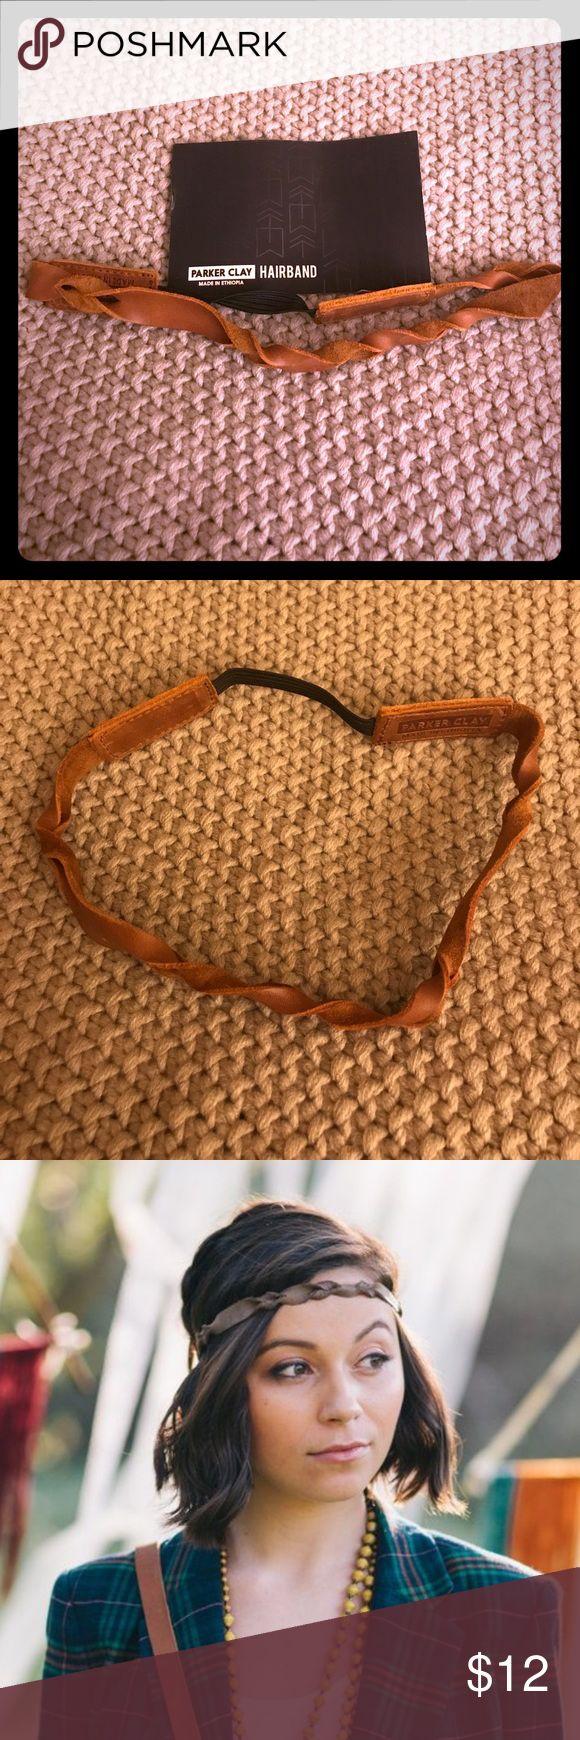 the 25+ best leather headbands ideas on pinterest | diy leather